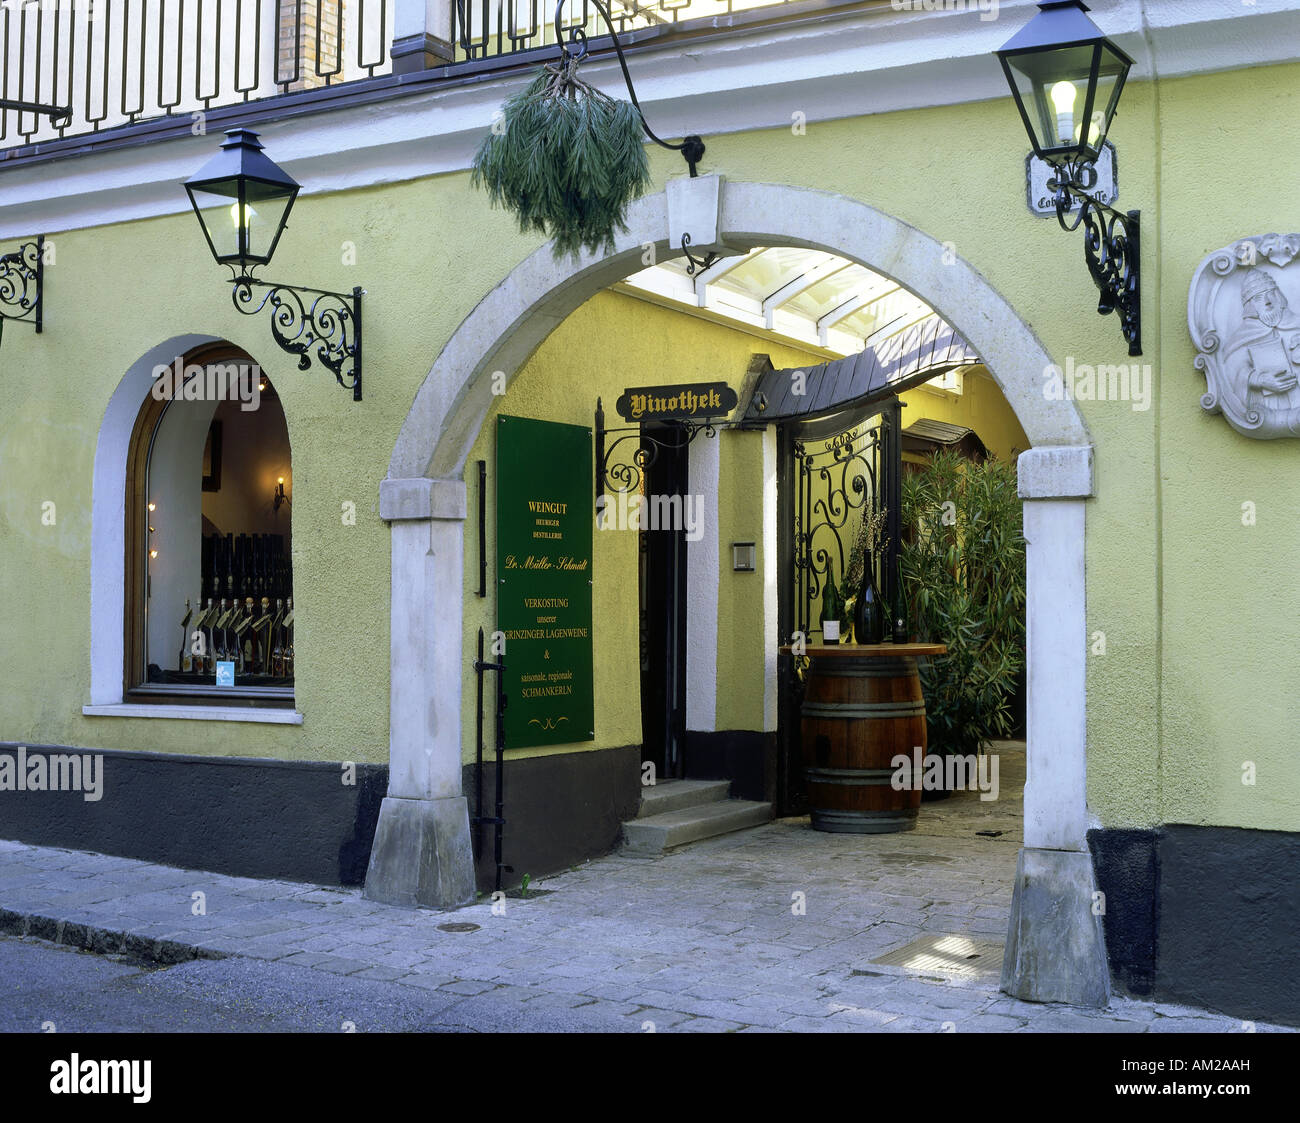 geography / travel, Austria, Vienna, gastronomy, vinotheque 'Dr. Müller - Schmidt' in Grinzing, exterior - Stock Image